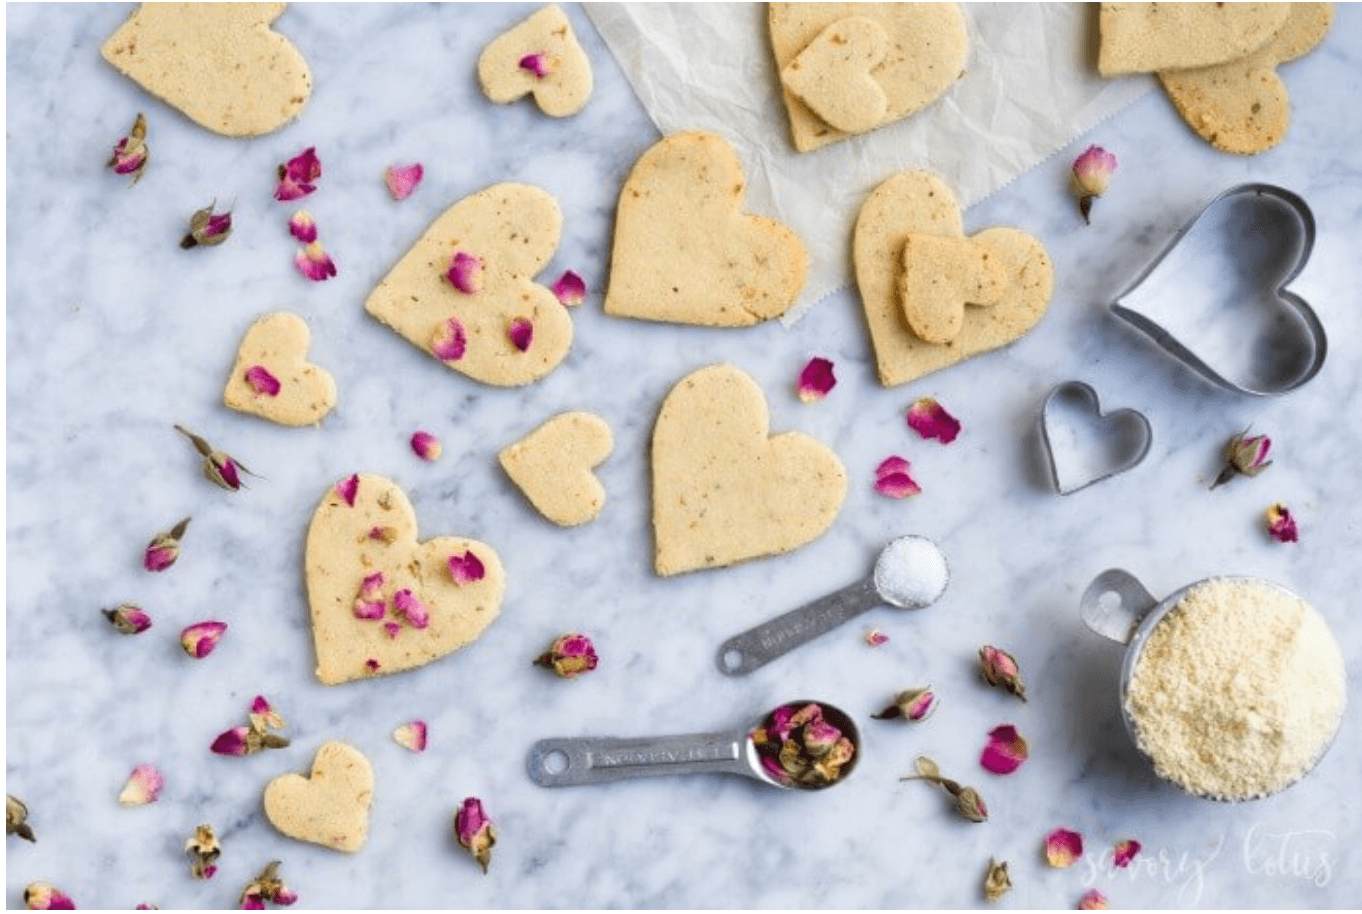 20 Healthy Edible Gift Ideas | rose shortbread cookies